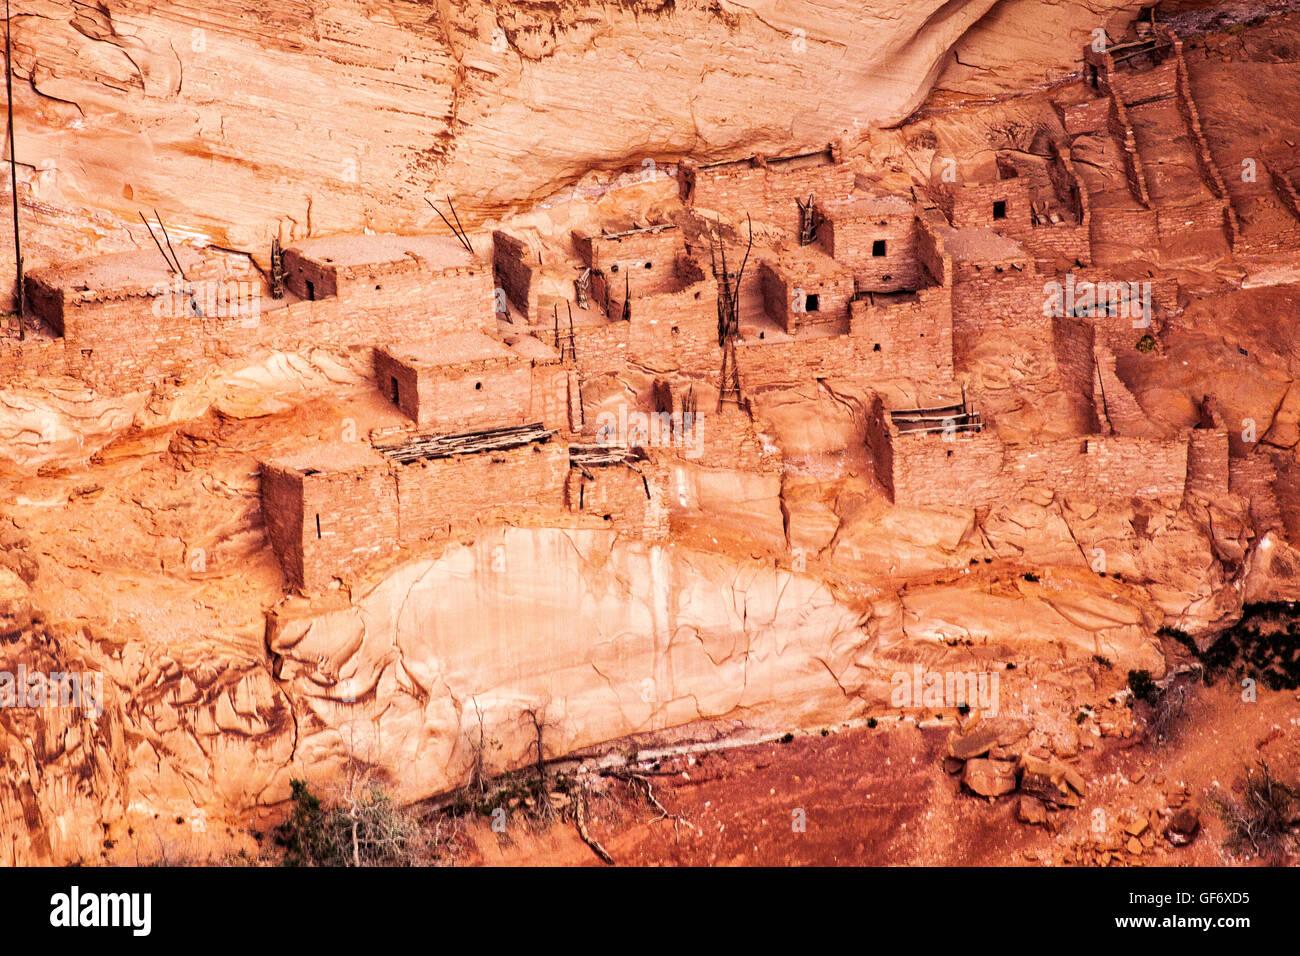 The historic Betatakin ruins in Navajo National Monument, Arizona. - Stock Image